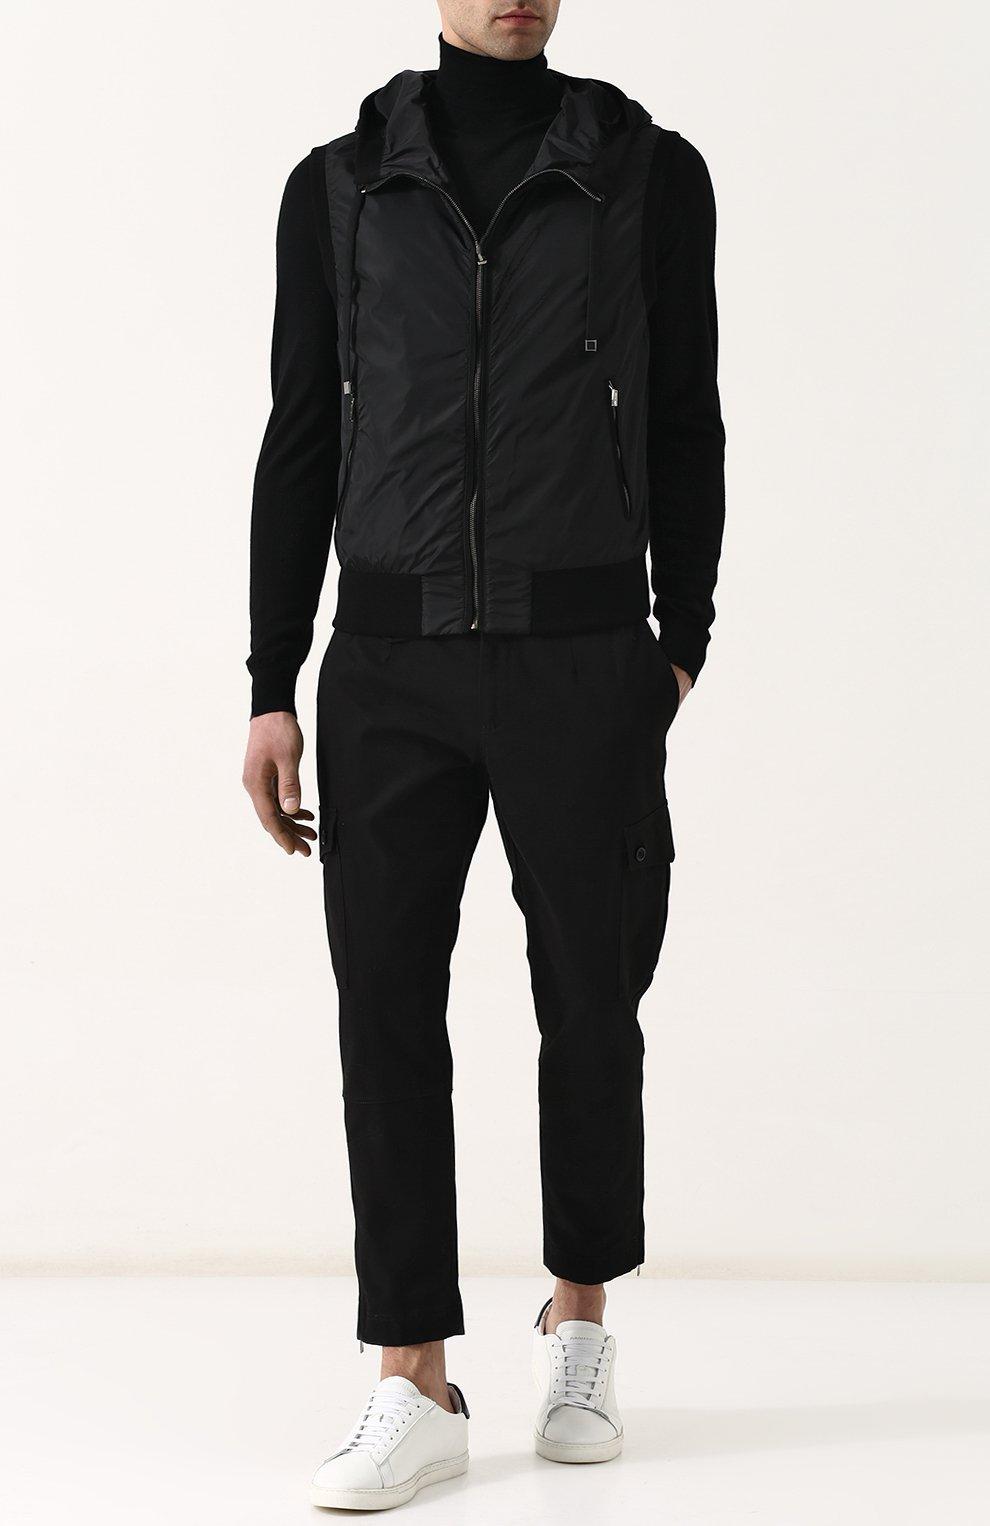 Мужской жилет на молнии с капюшоном DOLCE & GABBANA черного цвета, арт. G9KU0T/FUMQG   Фото 2